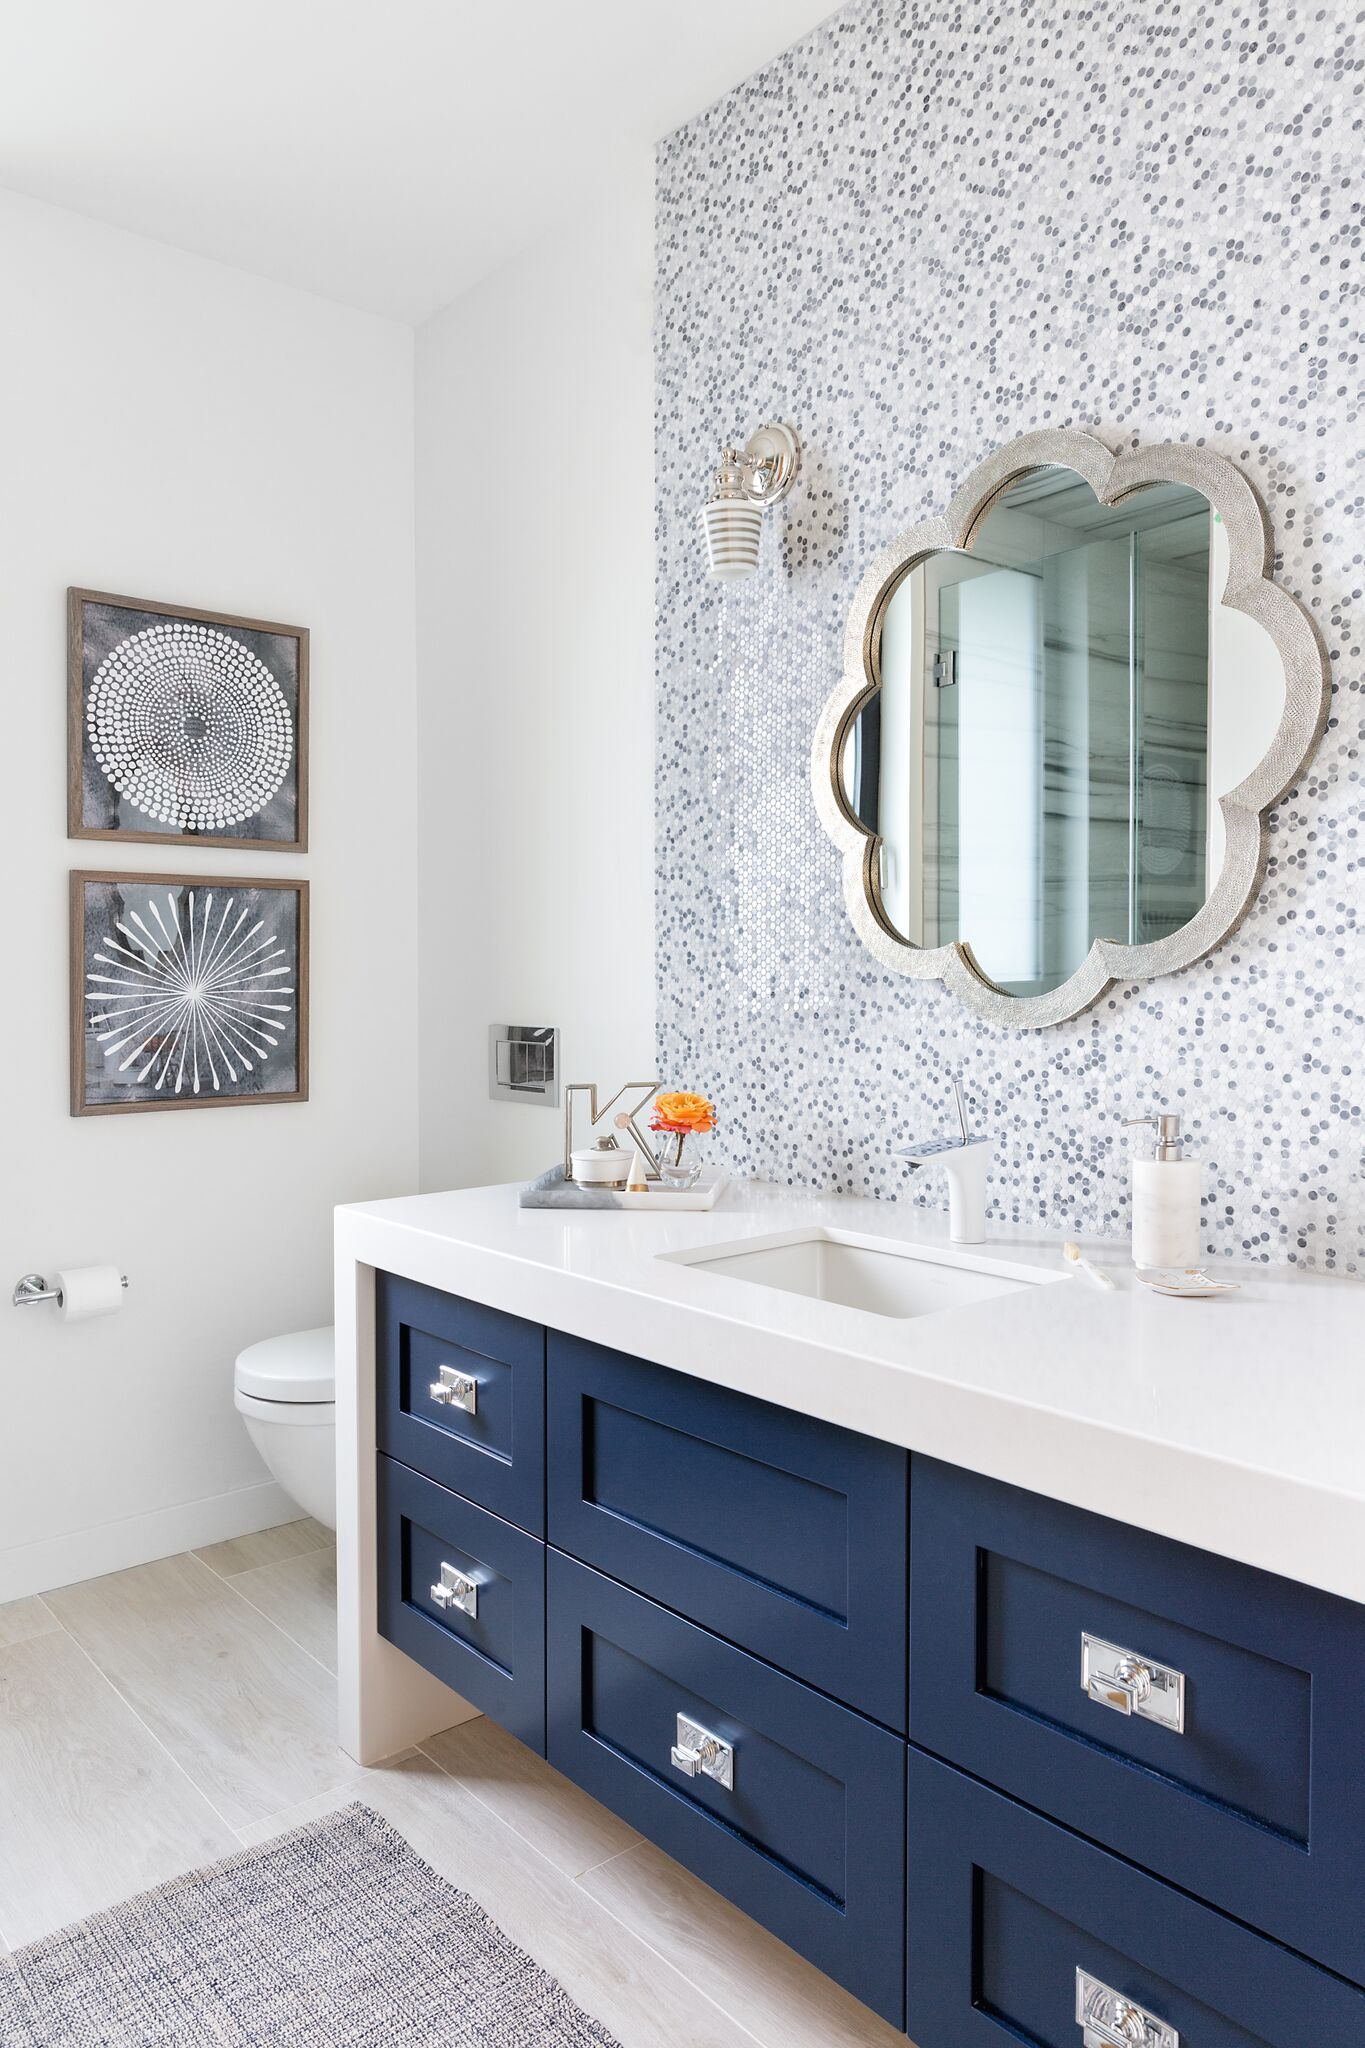 Girls Ensuite Bathroom Navy Vanity With Shades Of Grey And White Penny Round Backsplash Flowe Bathroom Remodel Cost Ensuite Bathrooms Bathroom Remodel Master